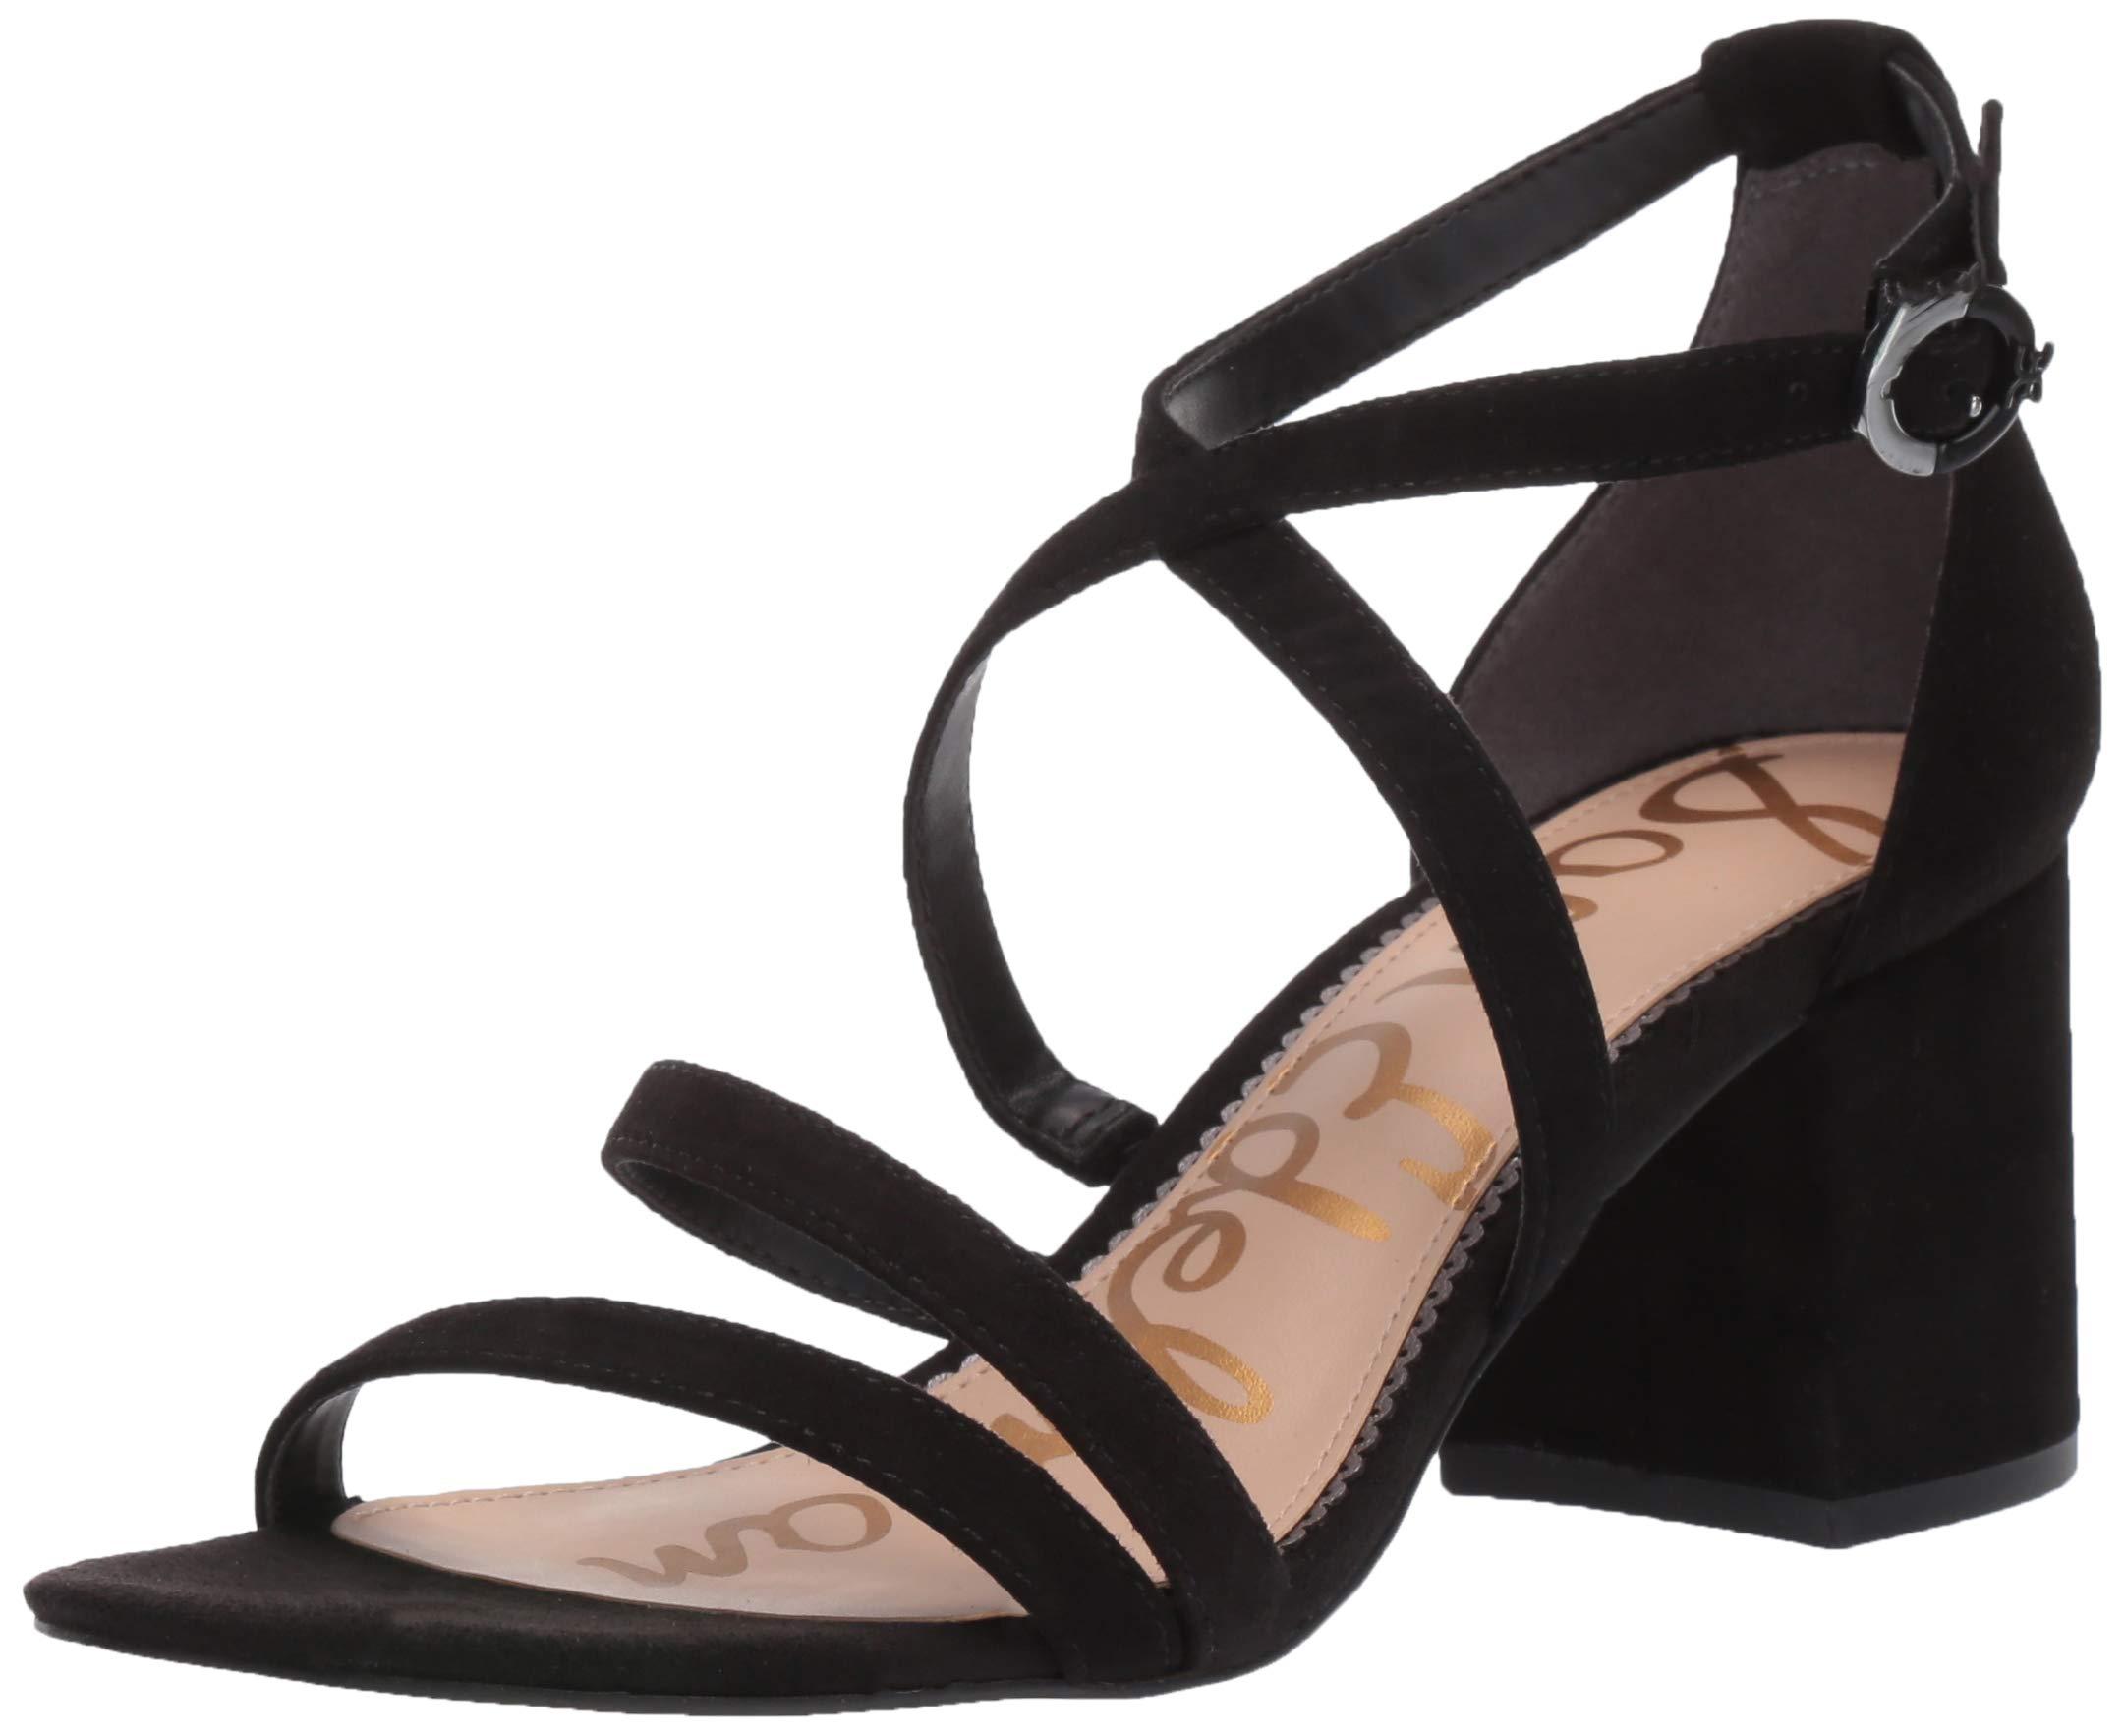 Sam Edelman Women's Stacie Sandal, Black Suede, 5.5 M US by Sam Edelman